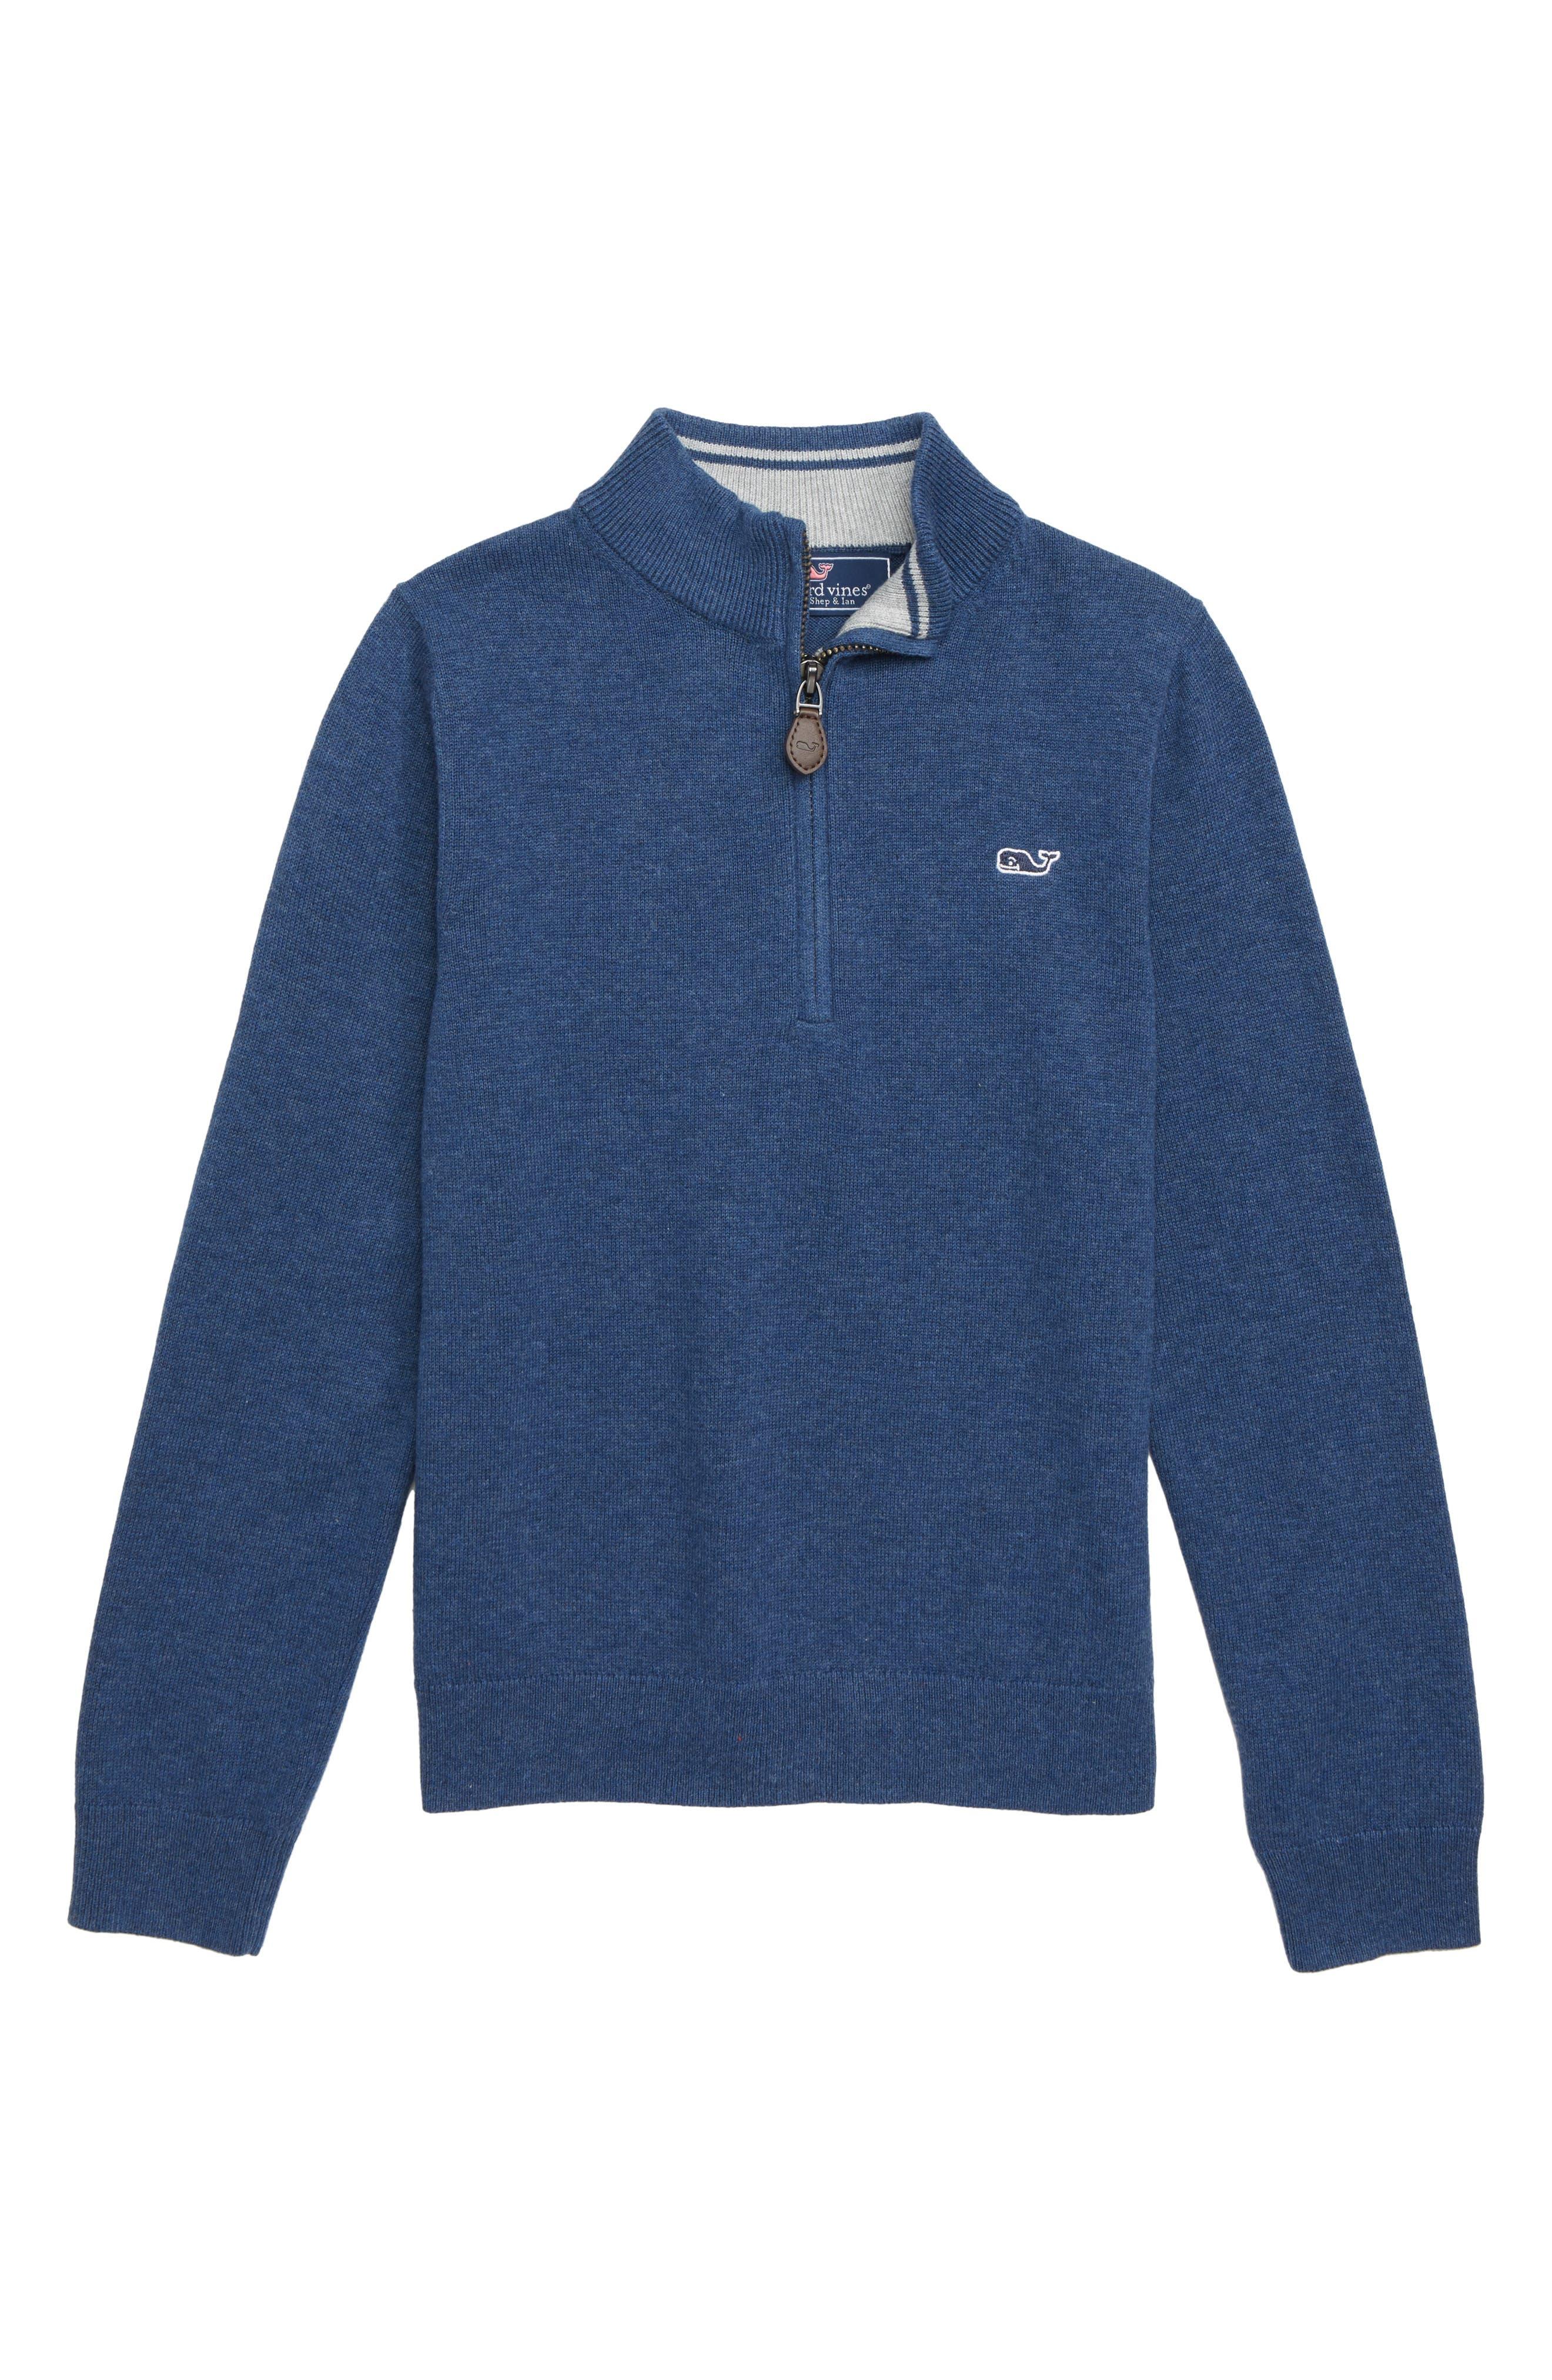 Boys Vineyard Vines Half Zip Sweater Size 5  Blue